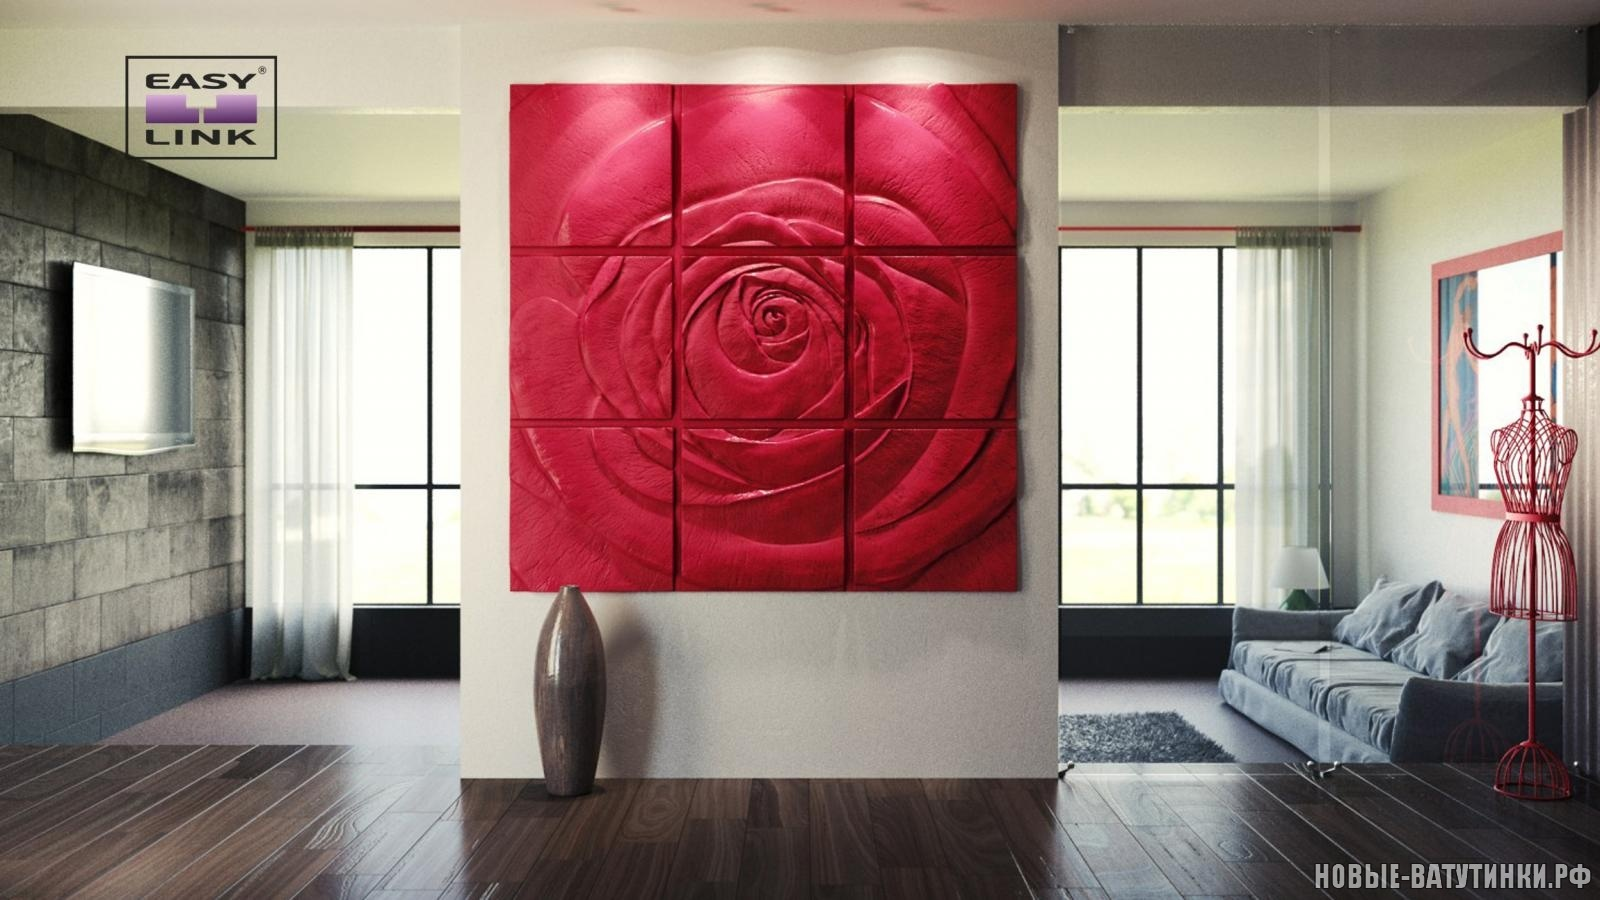 Rose 02.jpg